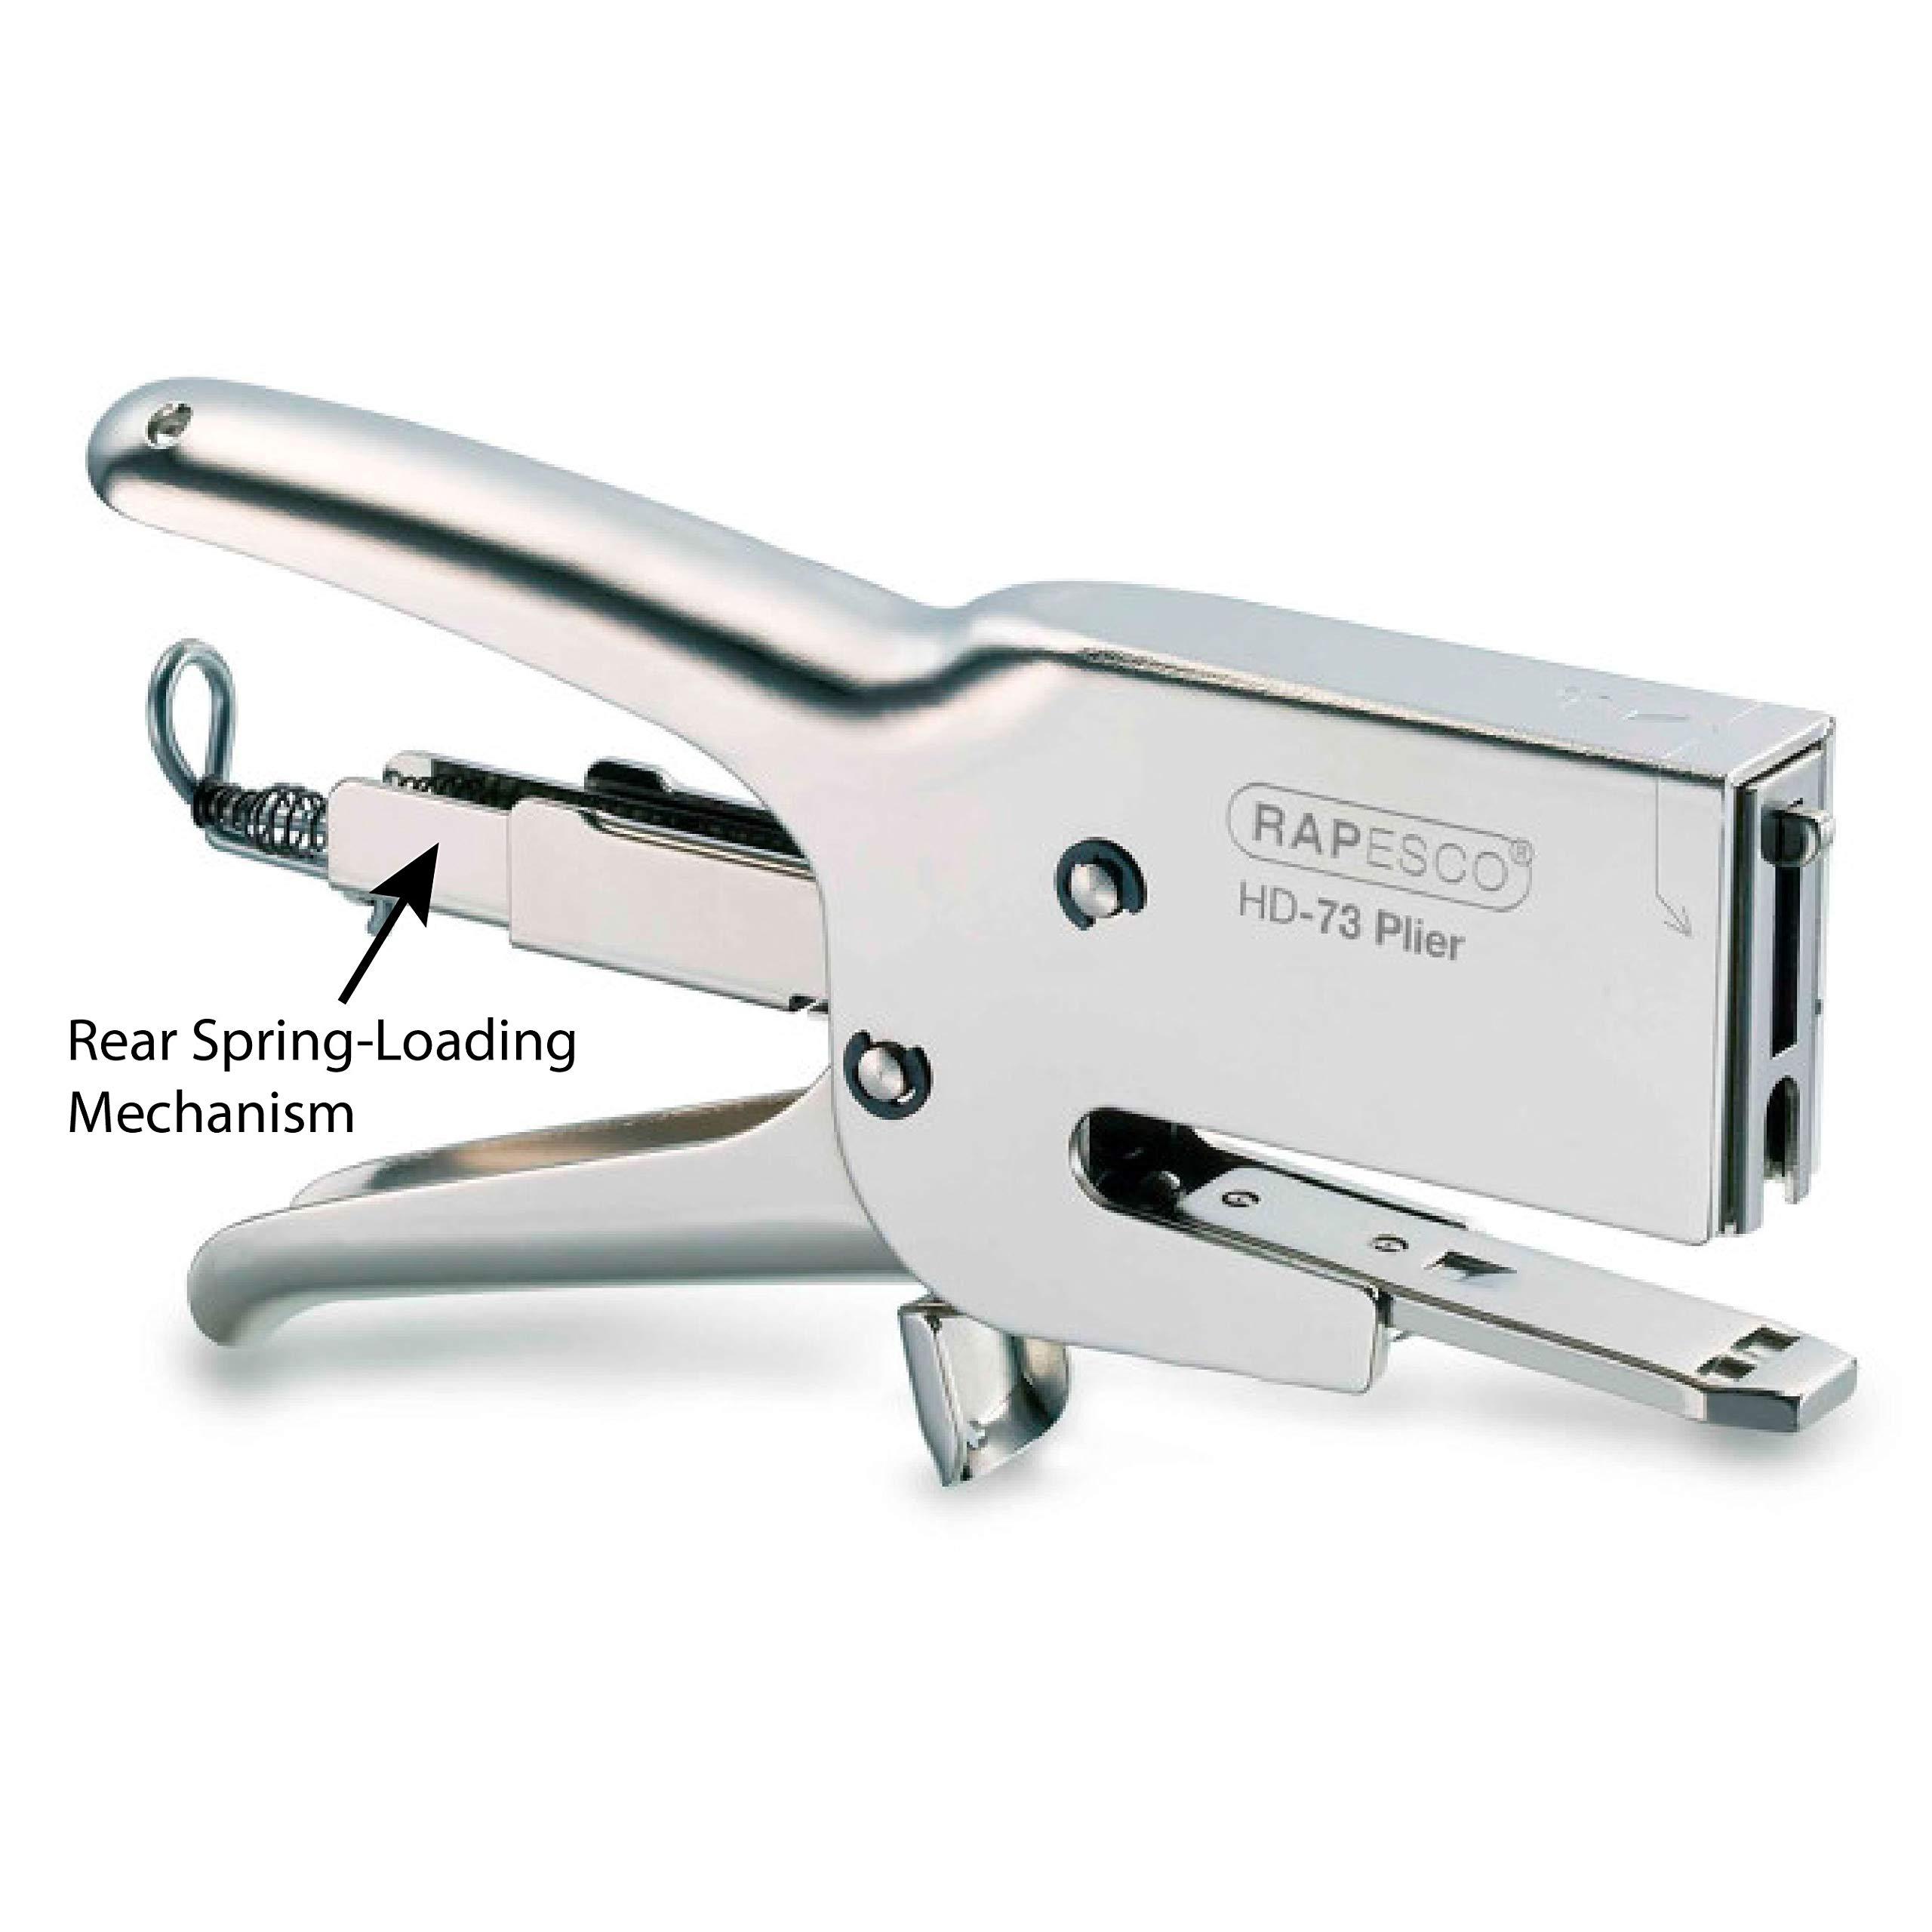 Rapesco Heavy-Duty 73 Packaging Plier Stapler, Uses 73 Type 1/4''-1/2'' Staples, Metal (1169) by Rapesco